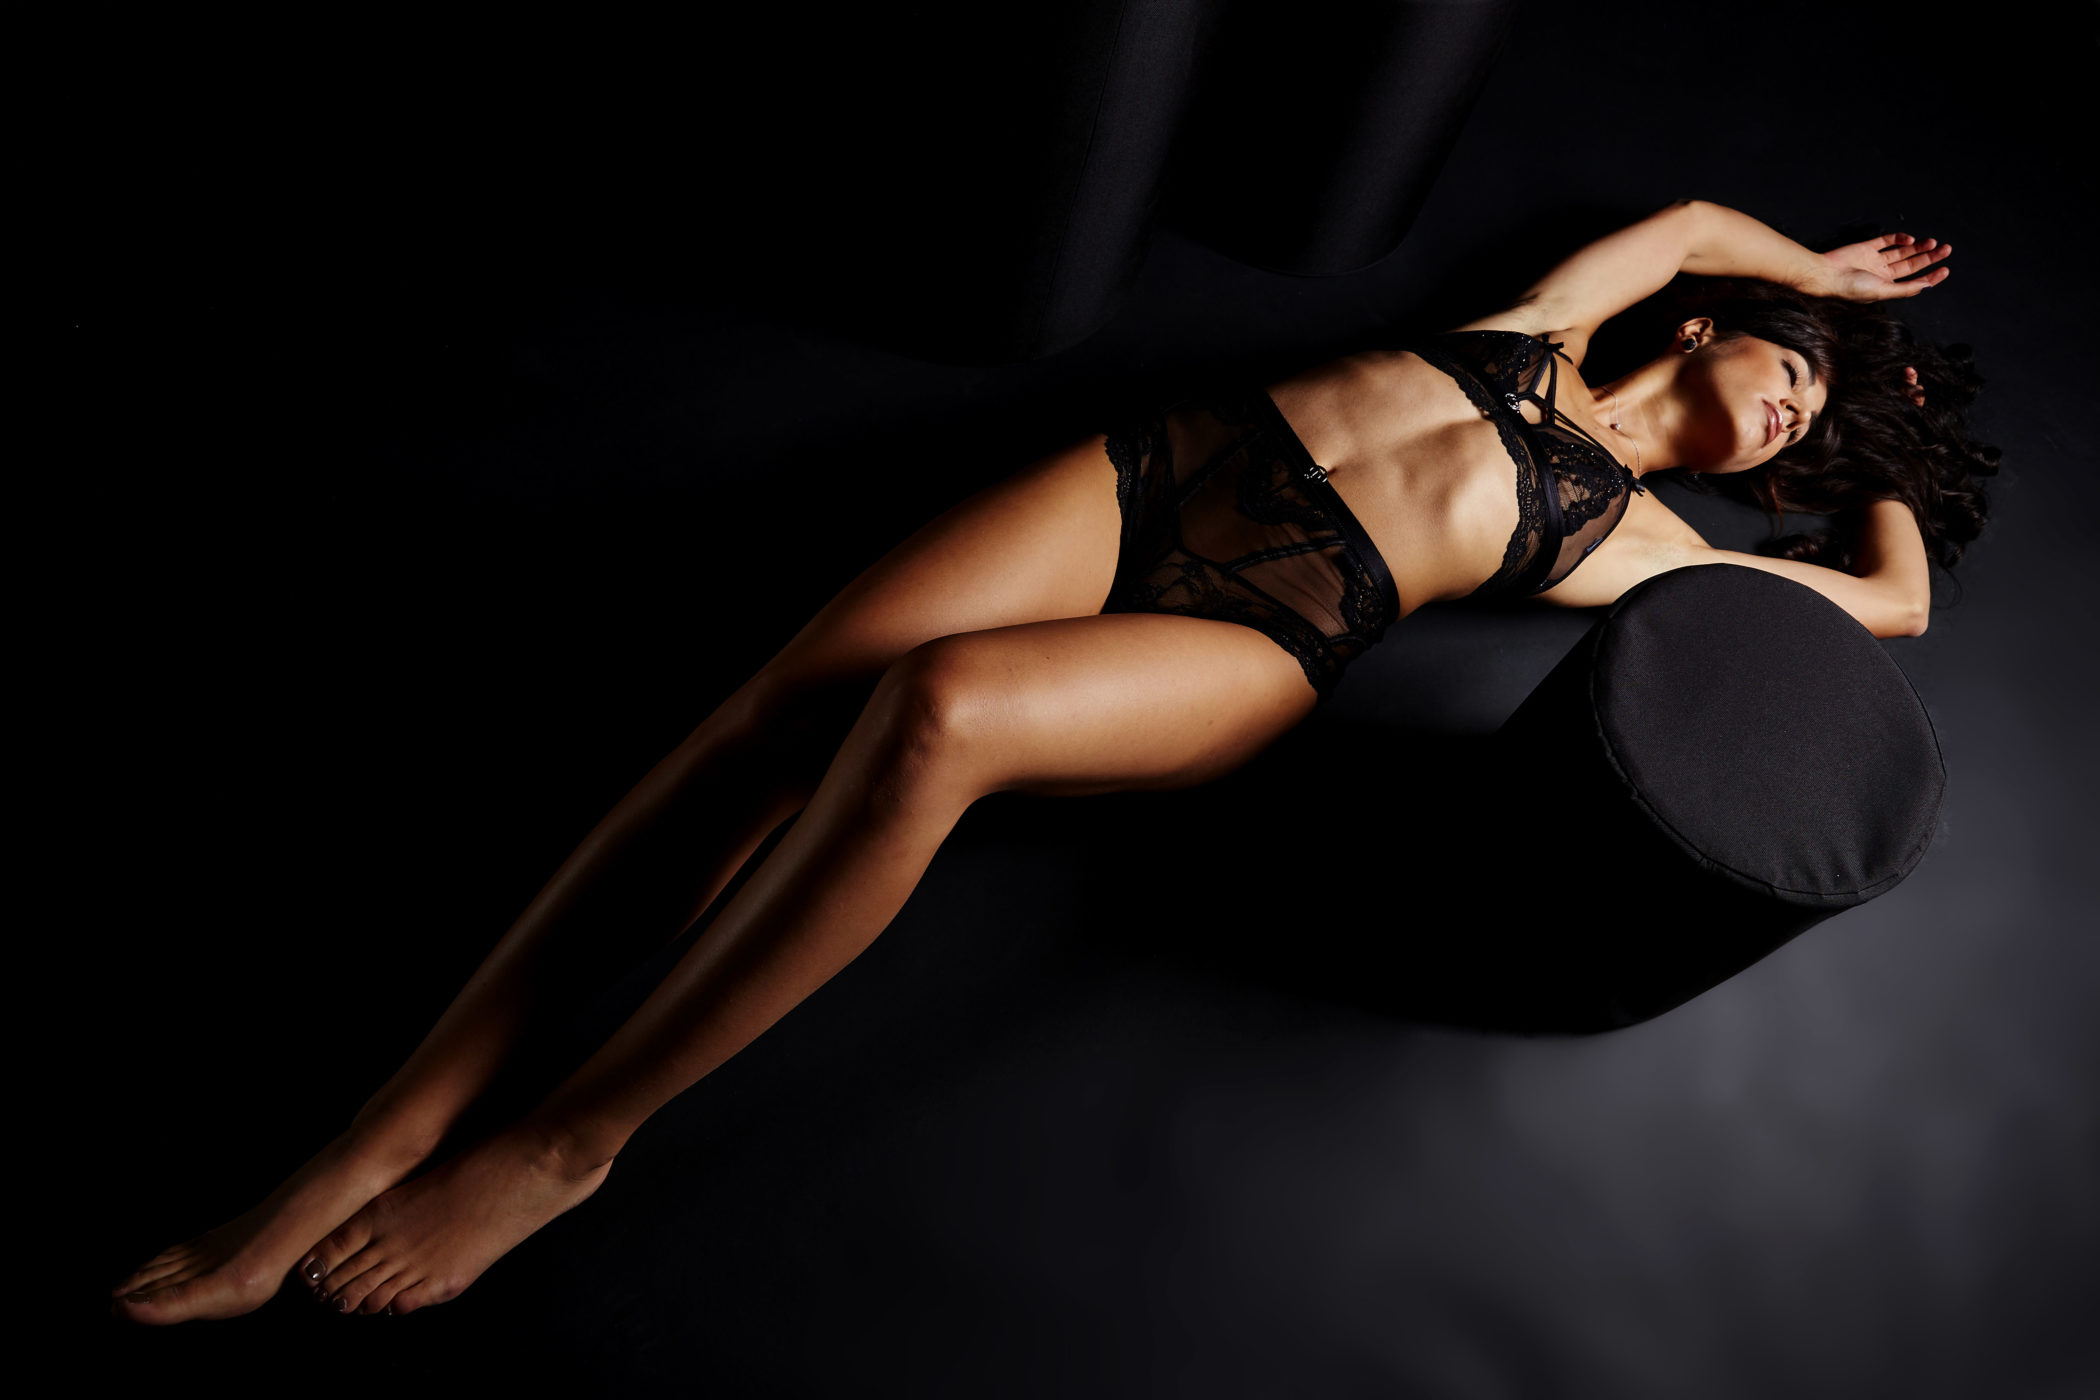 akt, erotische fotografie